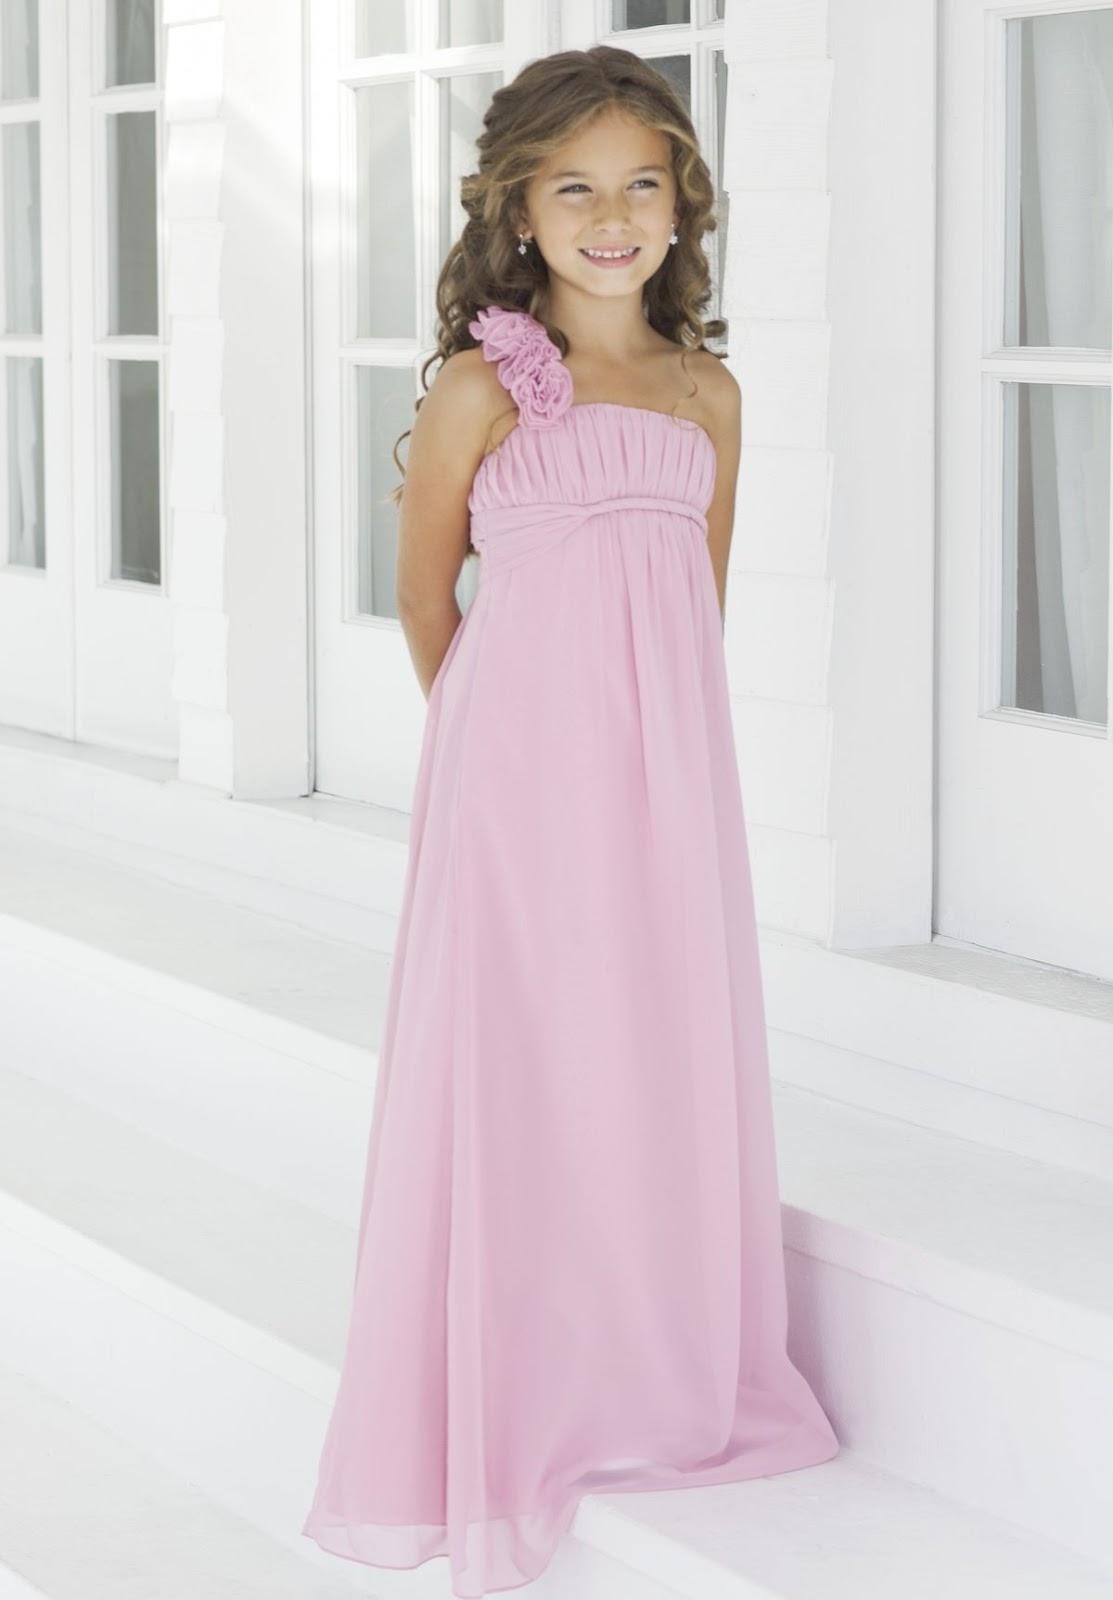 WhiteAzalea Junior Dresses: Pink Juniors Clothing for ...